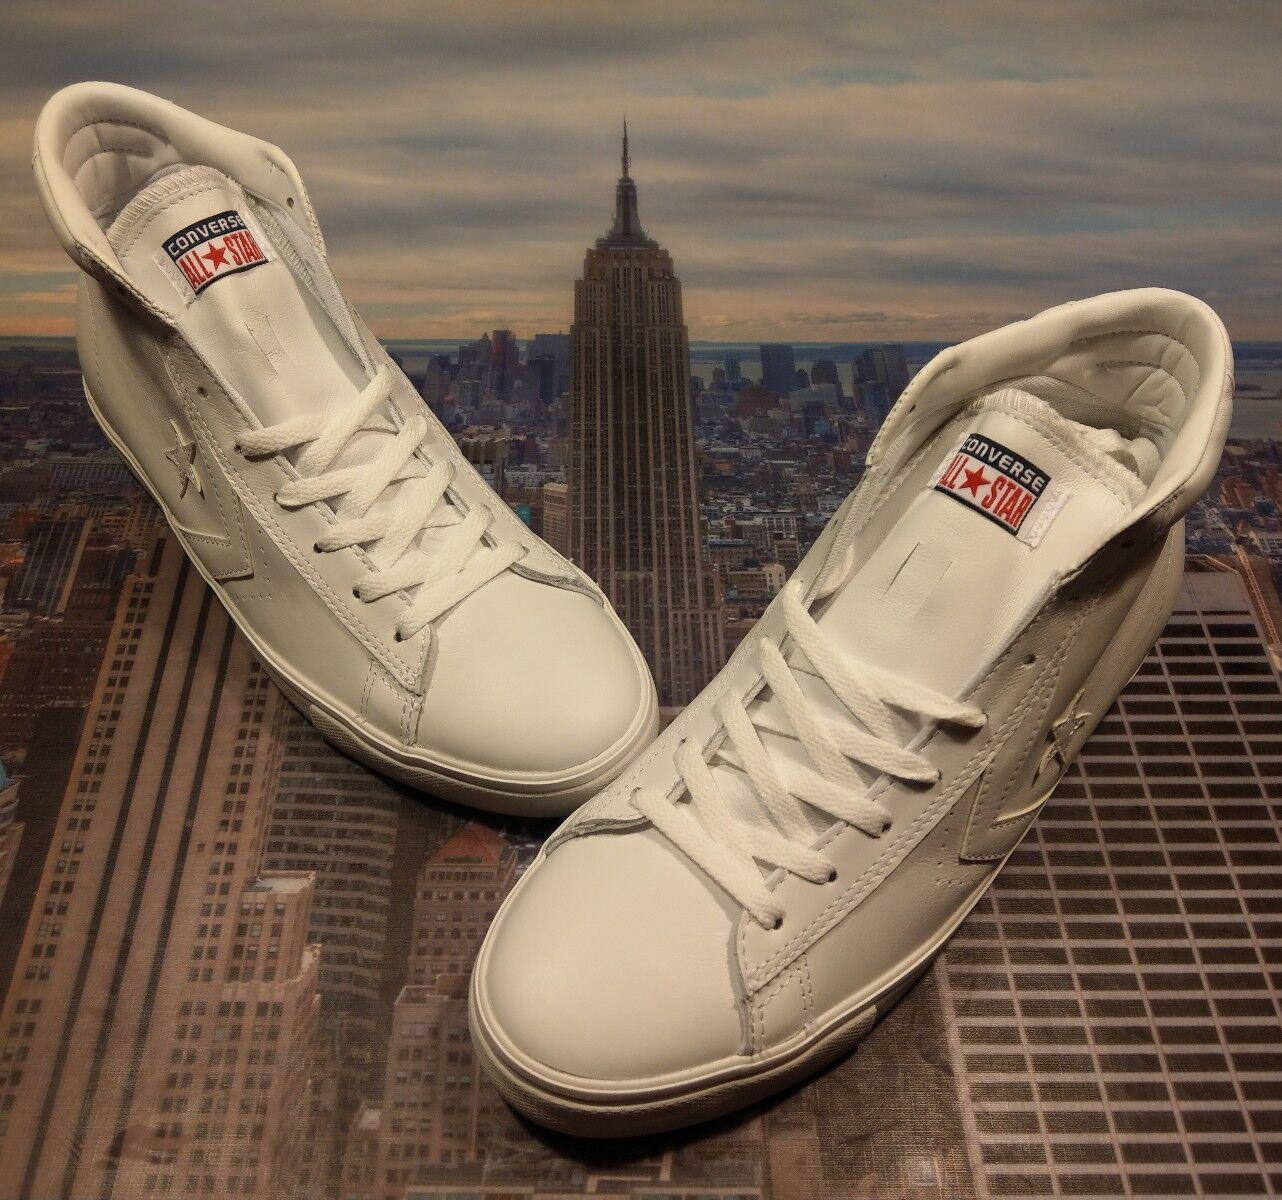 Converse Pro Size Leather Mid White/White Men's Size Pro 11 136764c New dab62e